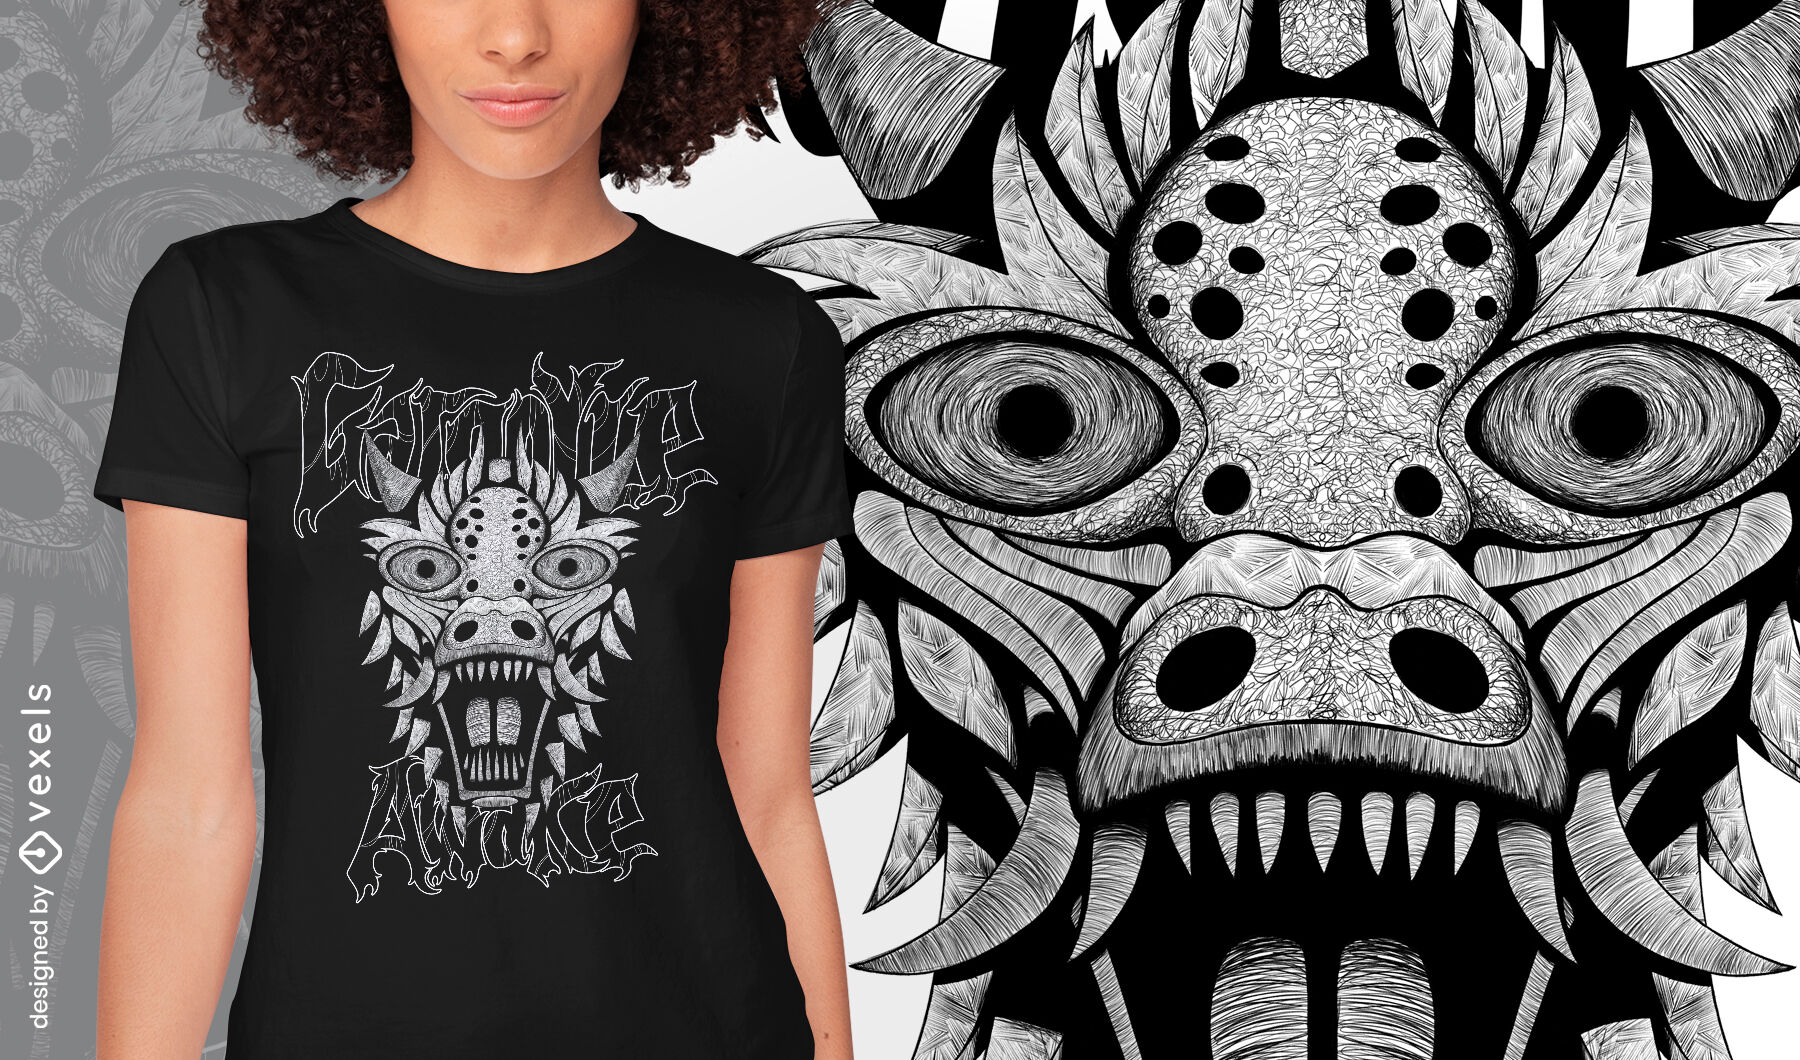 Gargoyle dragon monster hand drawn t-shirt psd